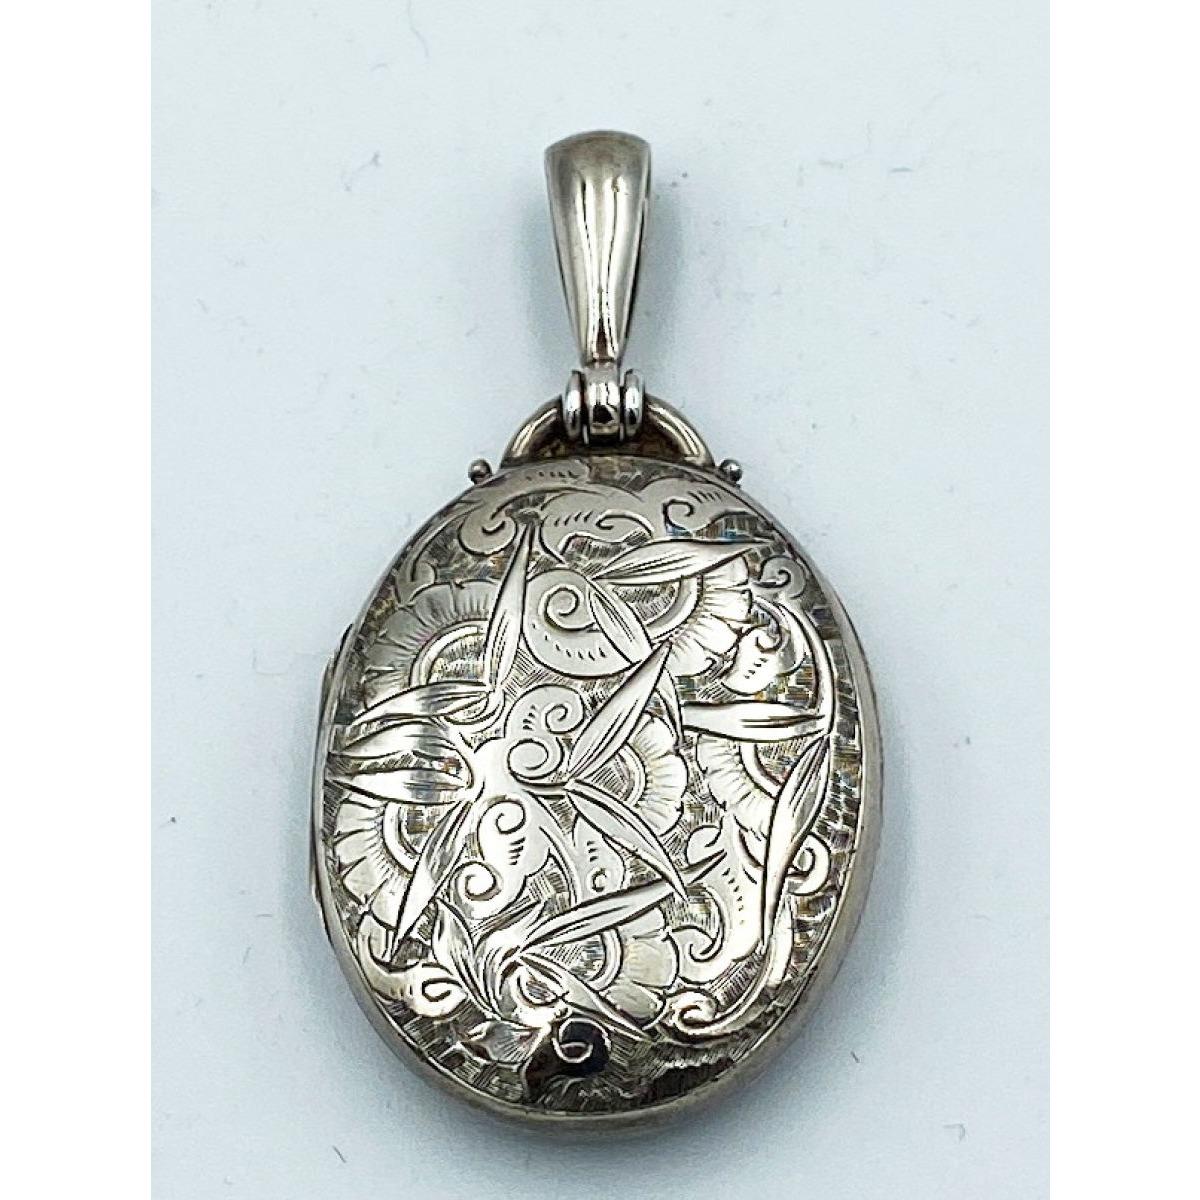 Interesting Artistic-Interpretted Floral Engraved Antique English Silver Locket